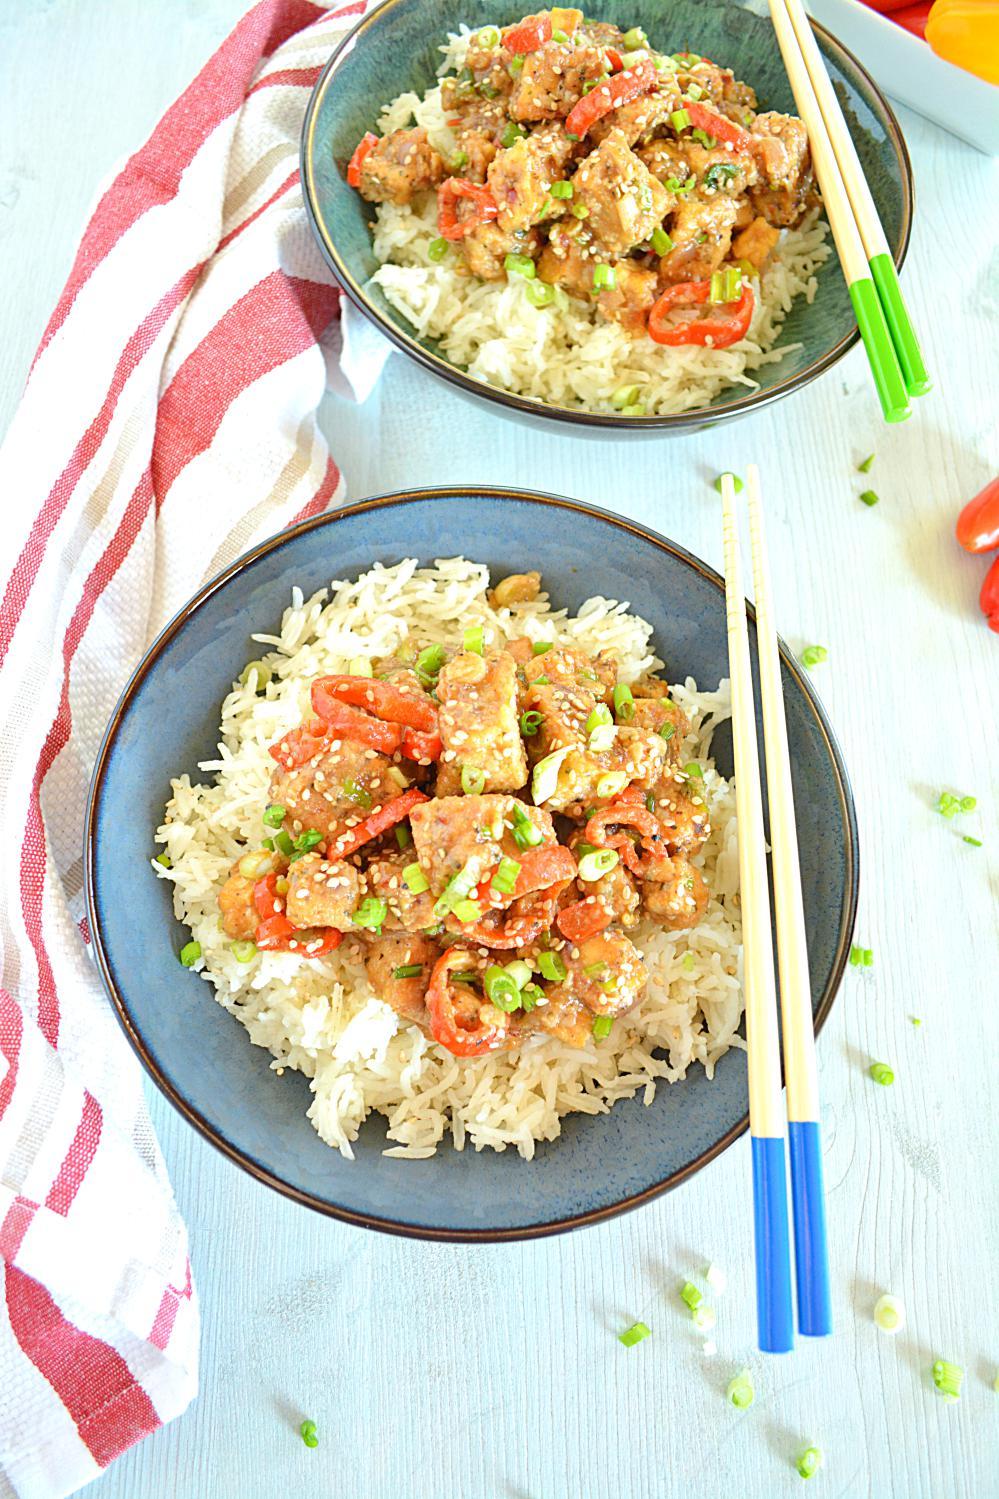 Spicy Stir Fry tofu Recipe